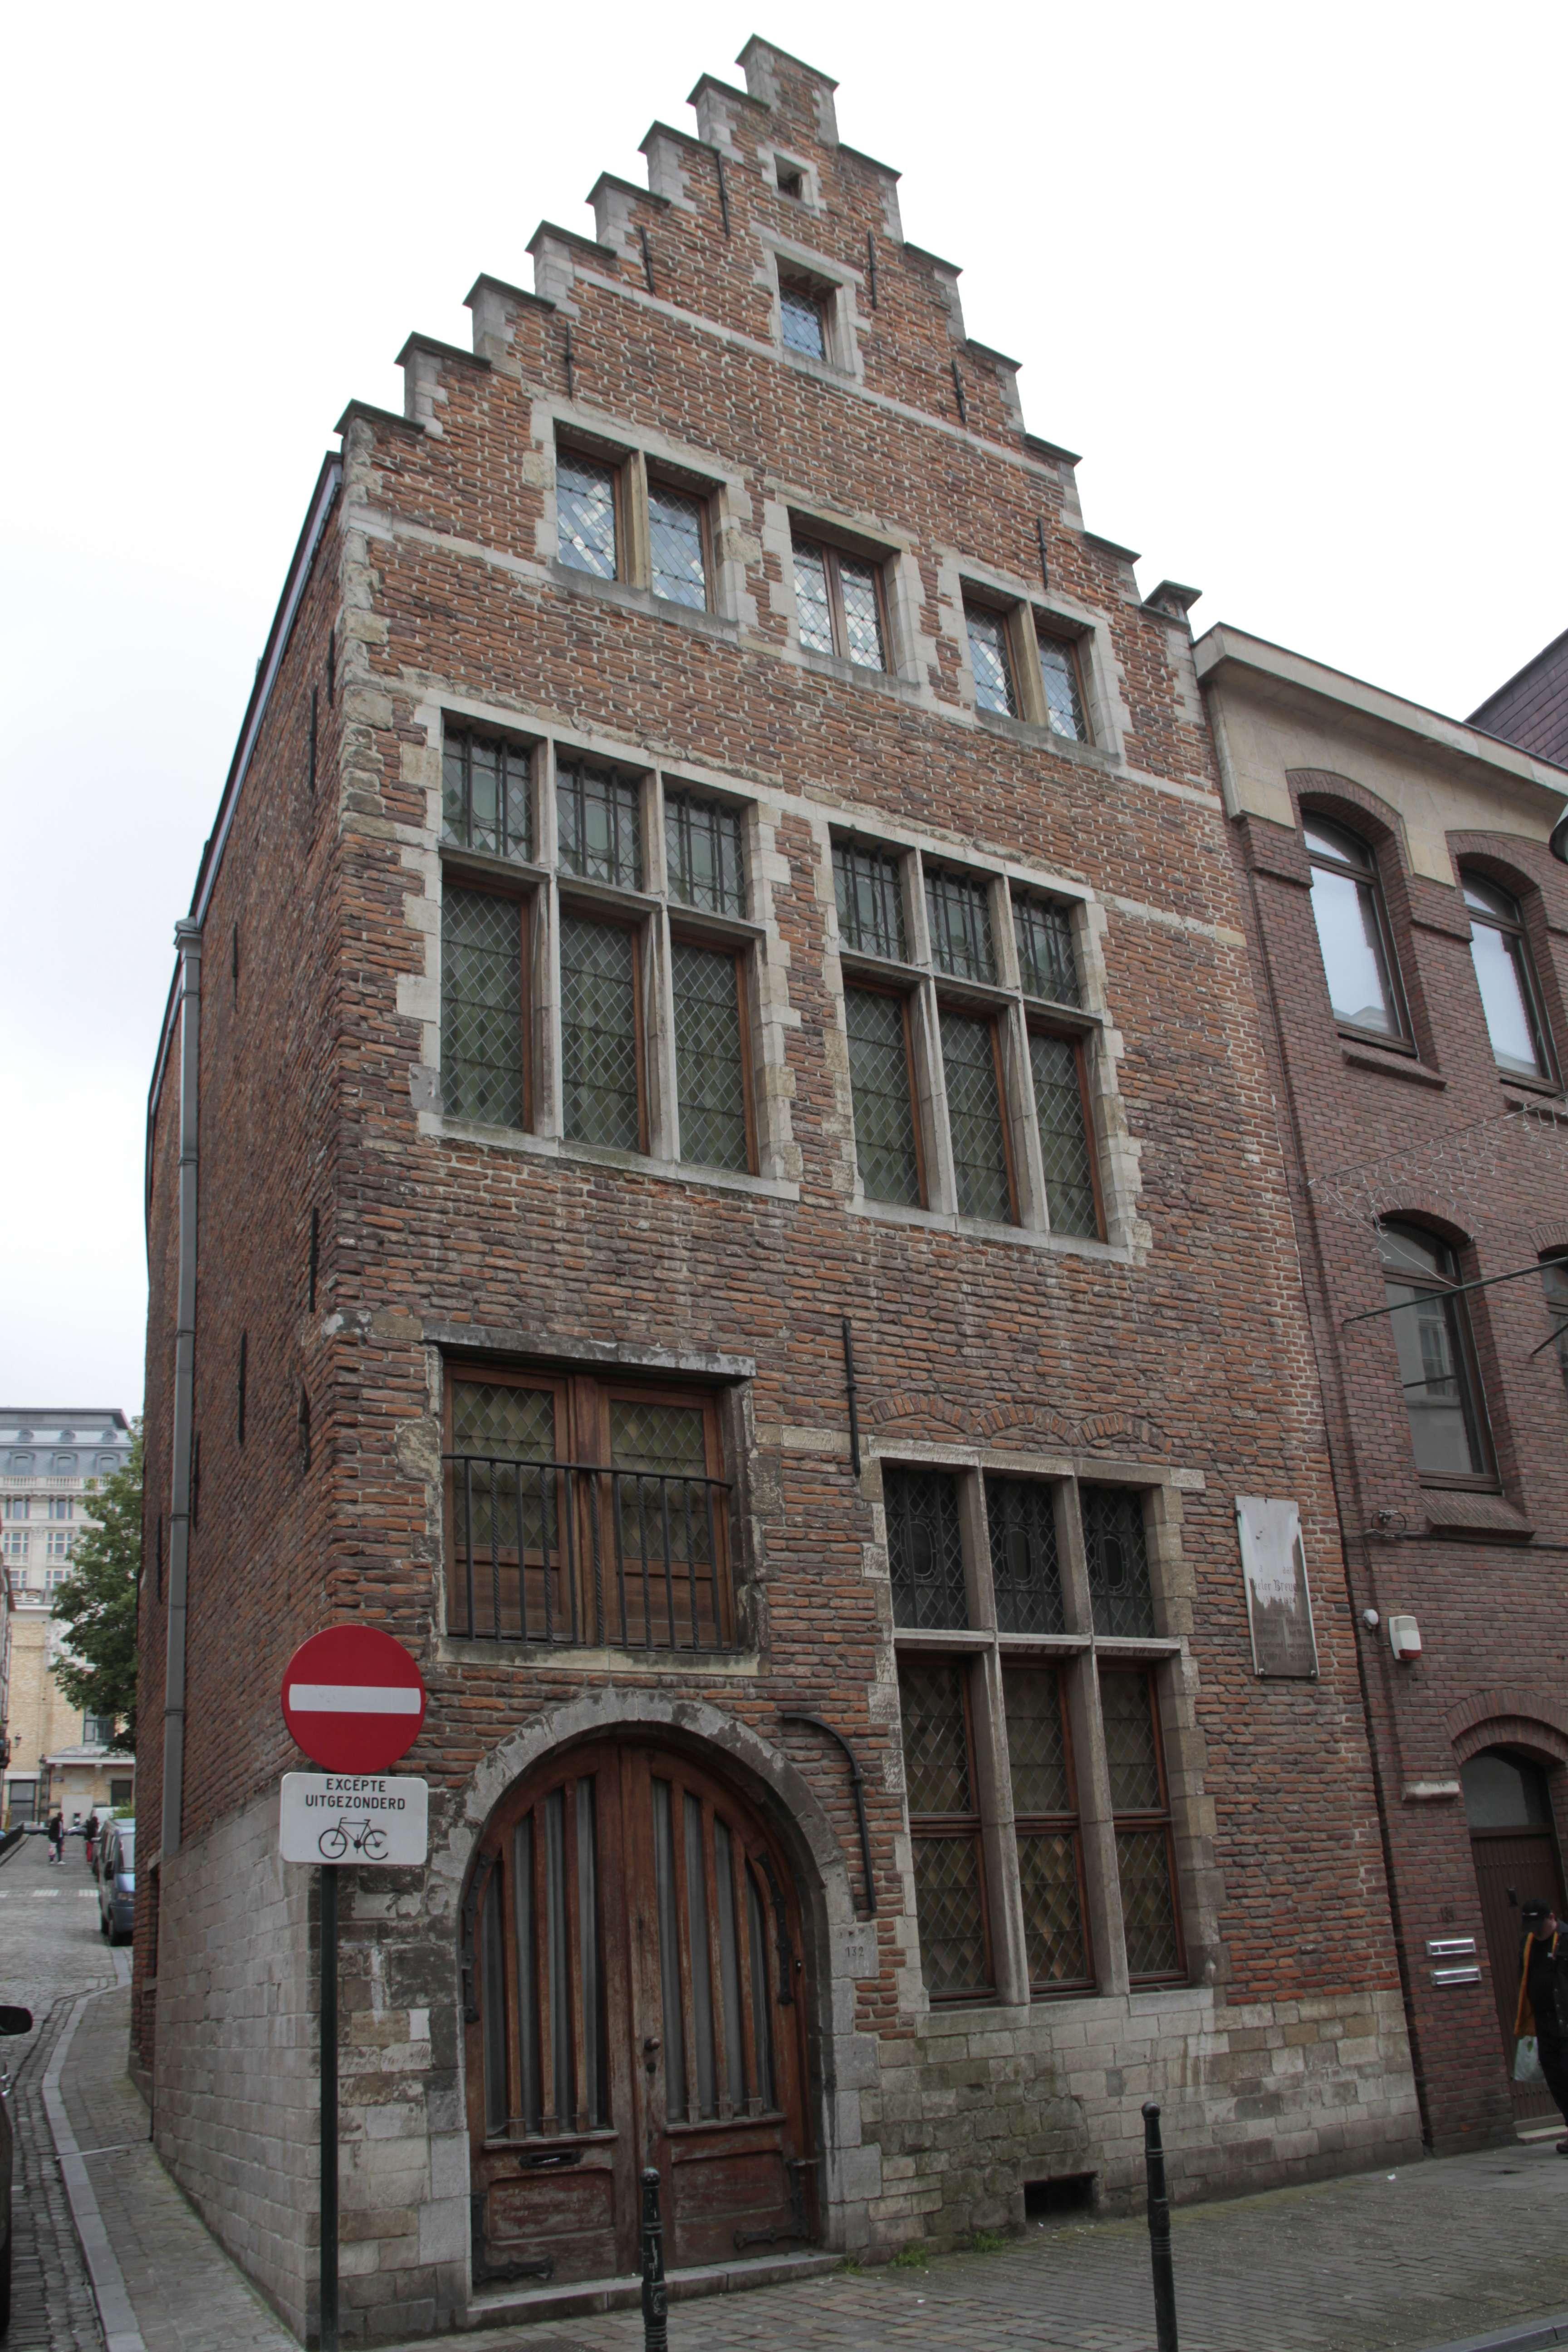 Belgique mai 2015_0279 Bruxelles Marolles maison Bruegel